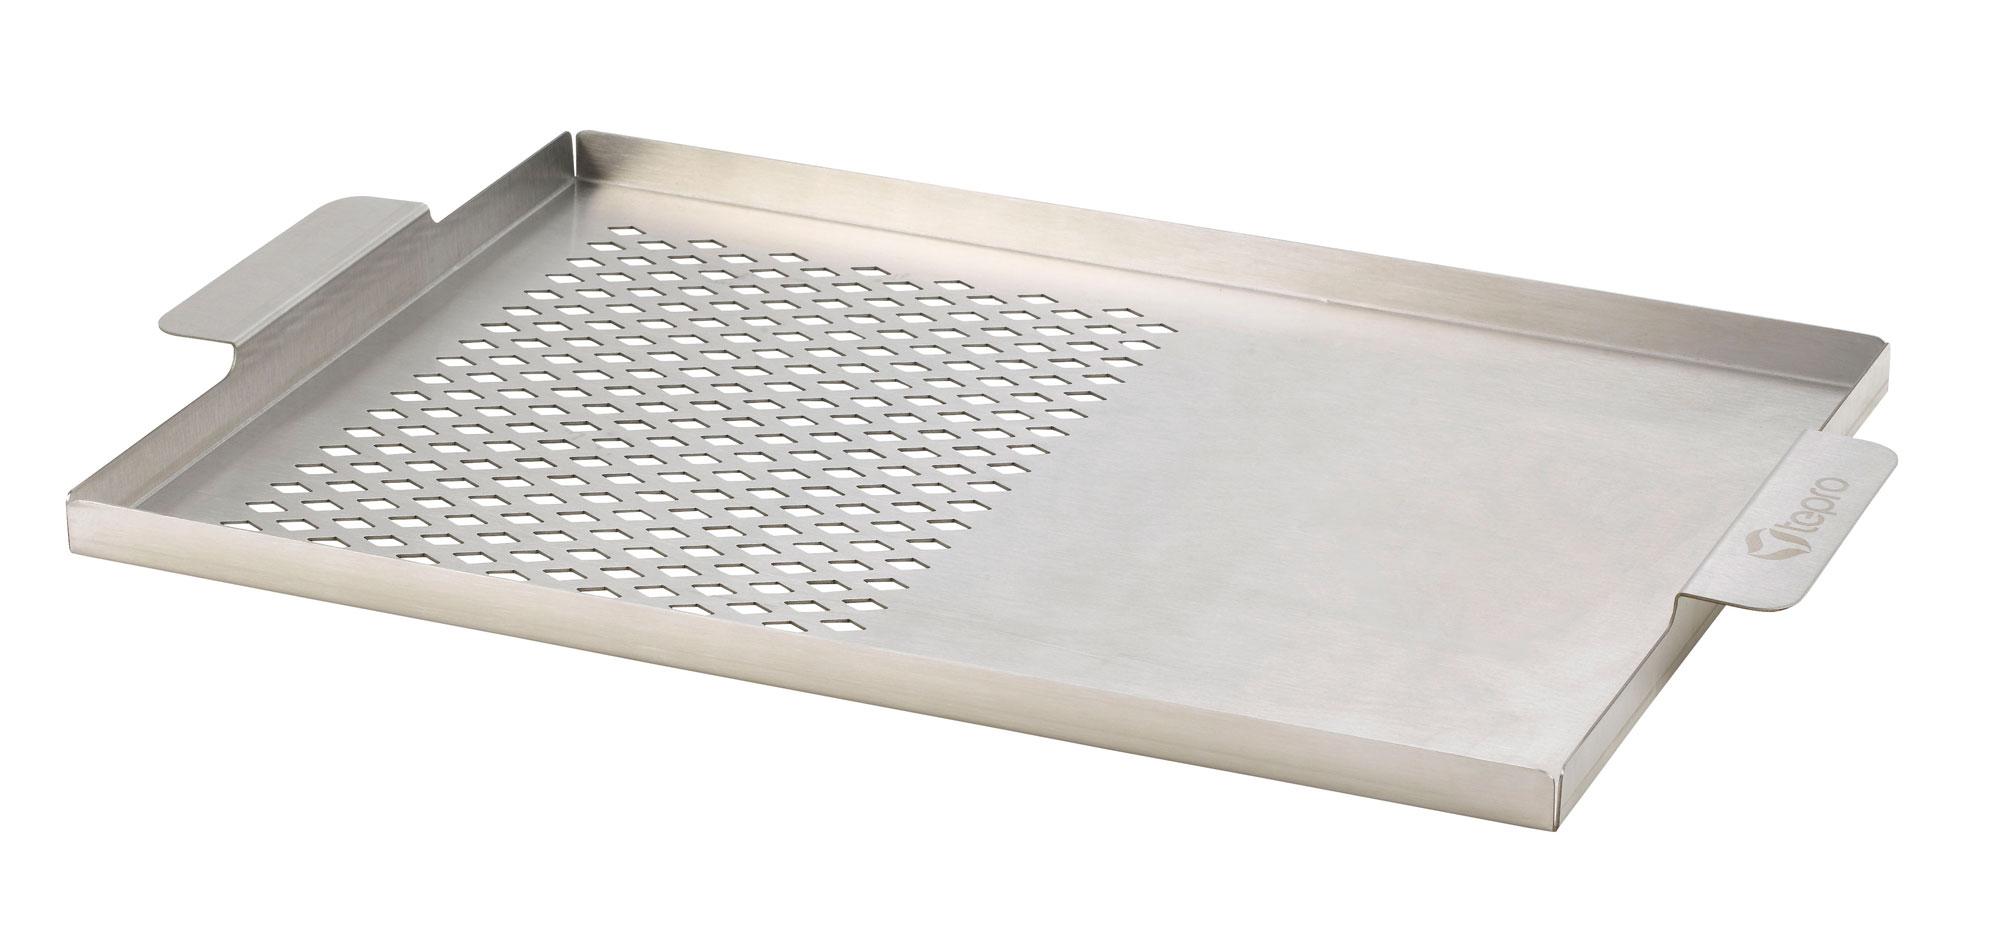 Grillplatte 2-in-1 L Tepro Edelstahl 42,5 x 26,2 cm Bild 1